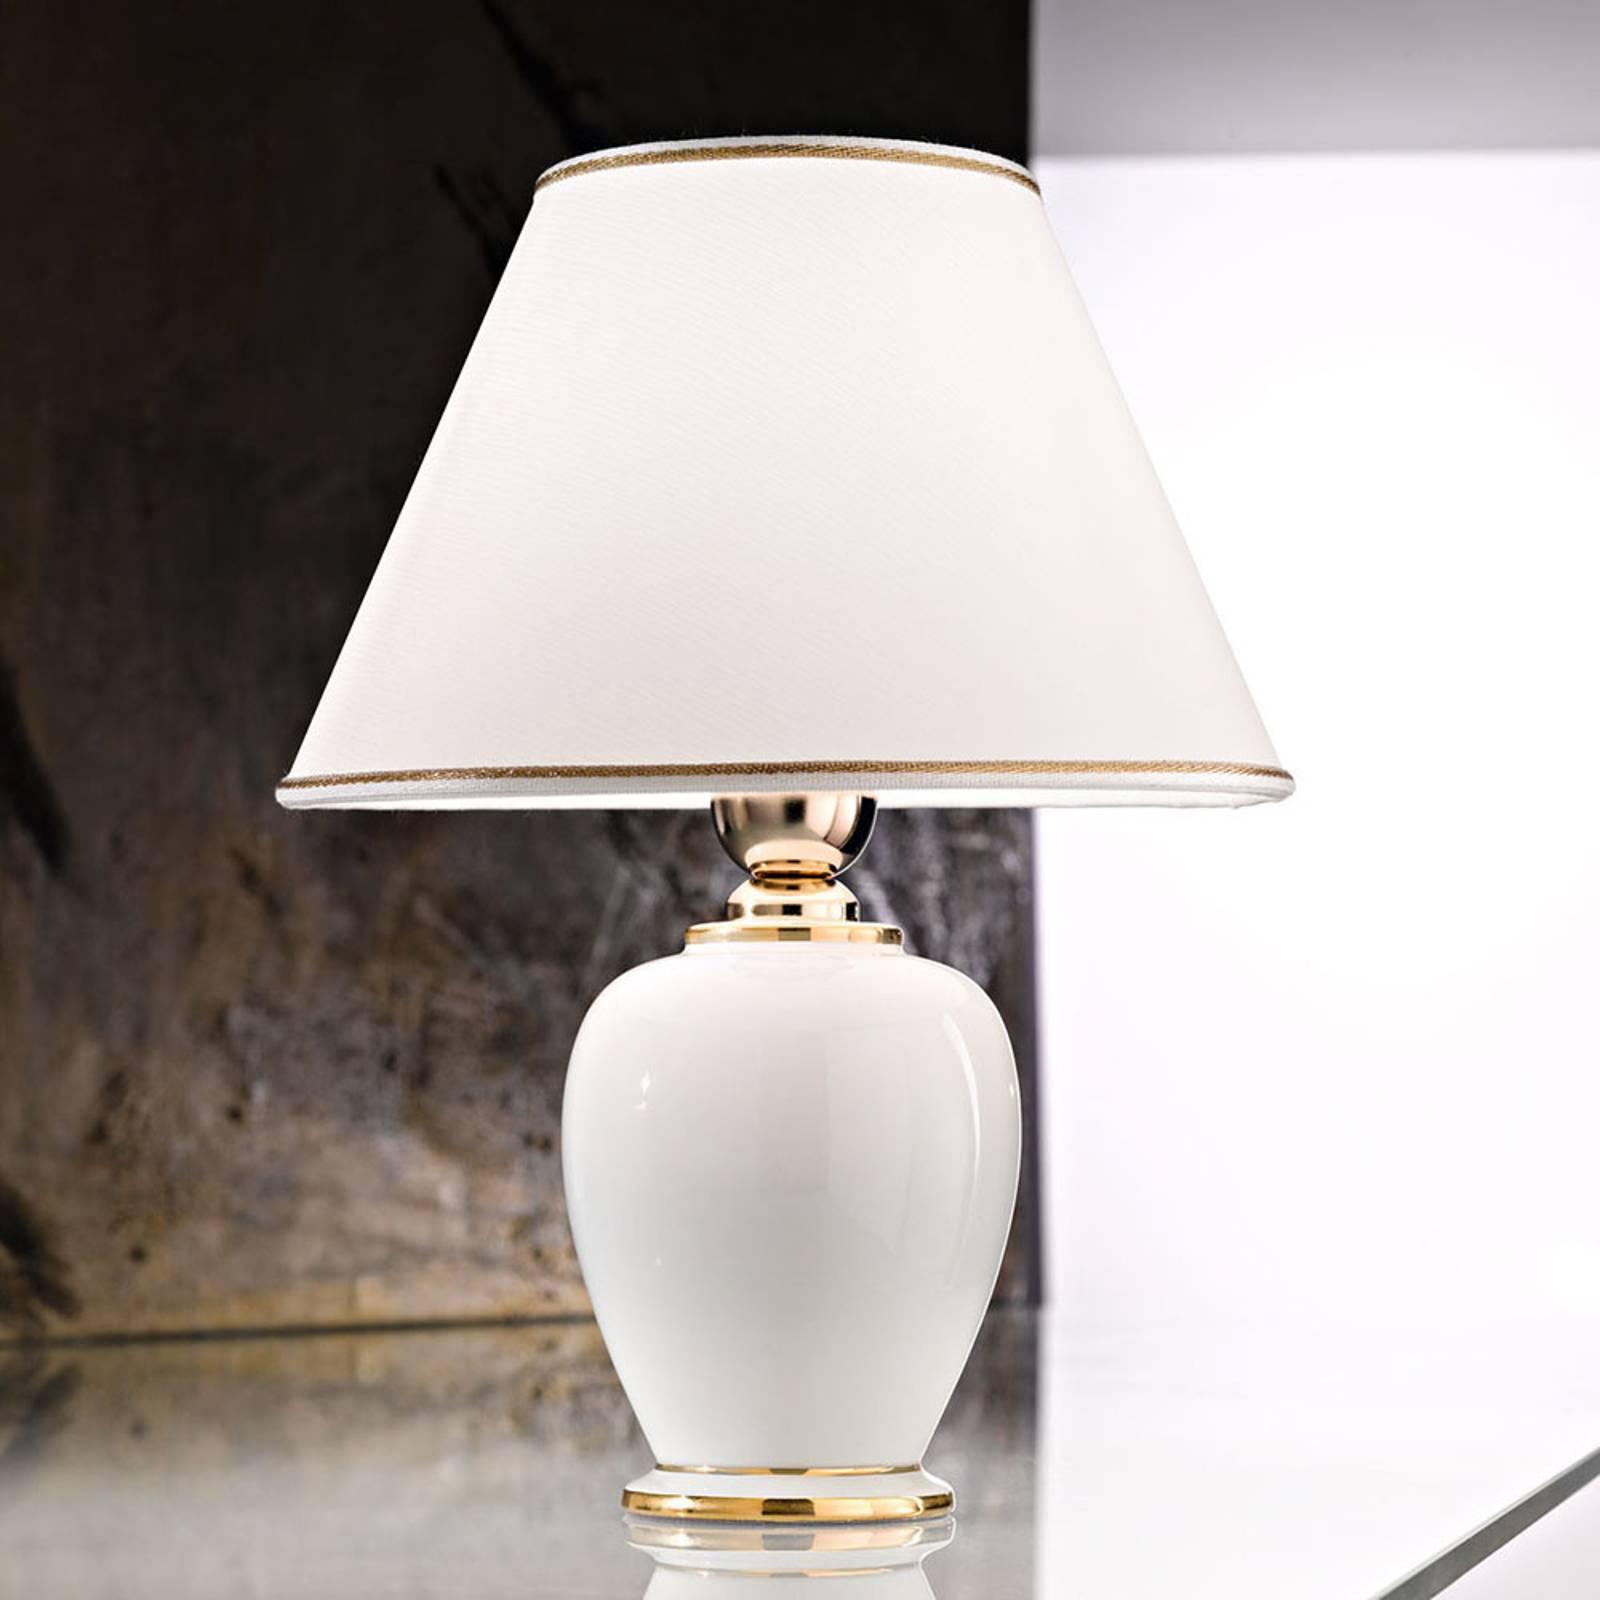 Tafellamp Giardino Avorio in wit-goud, Ø 25 cm